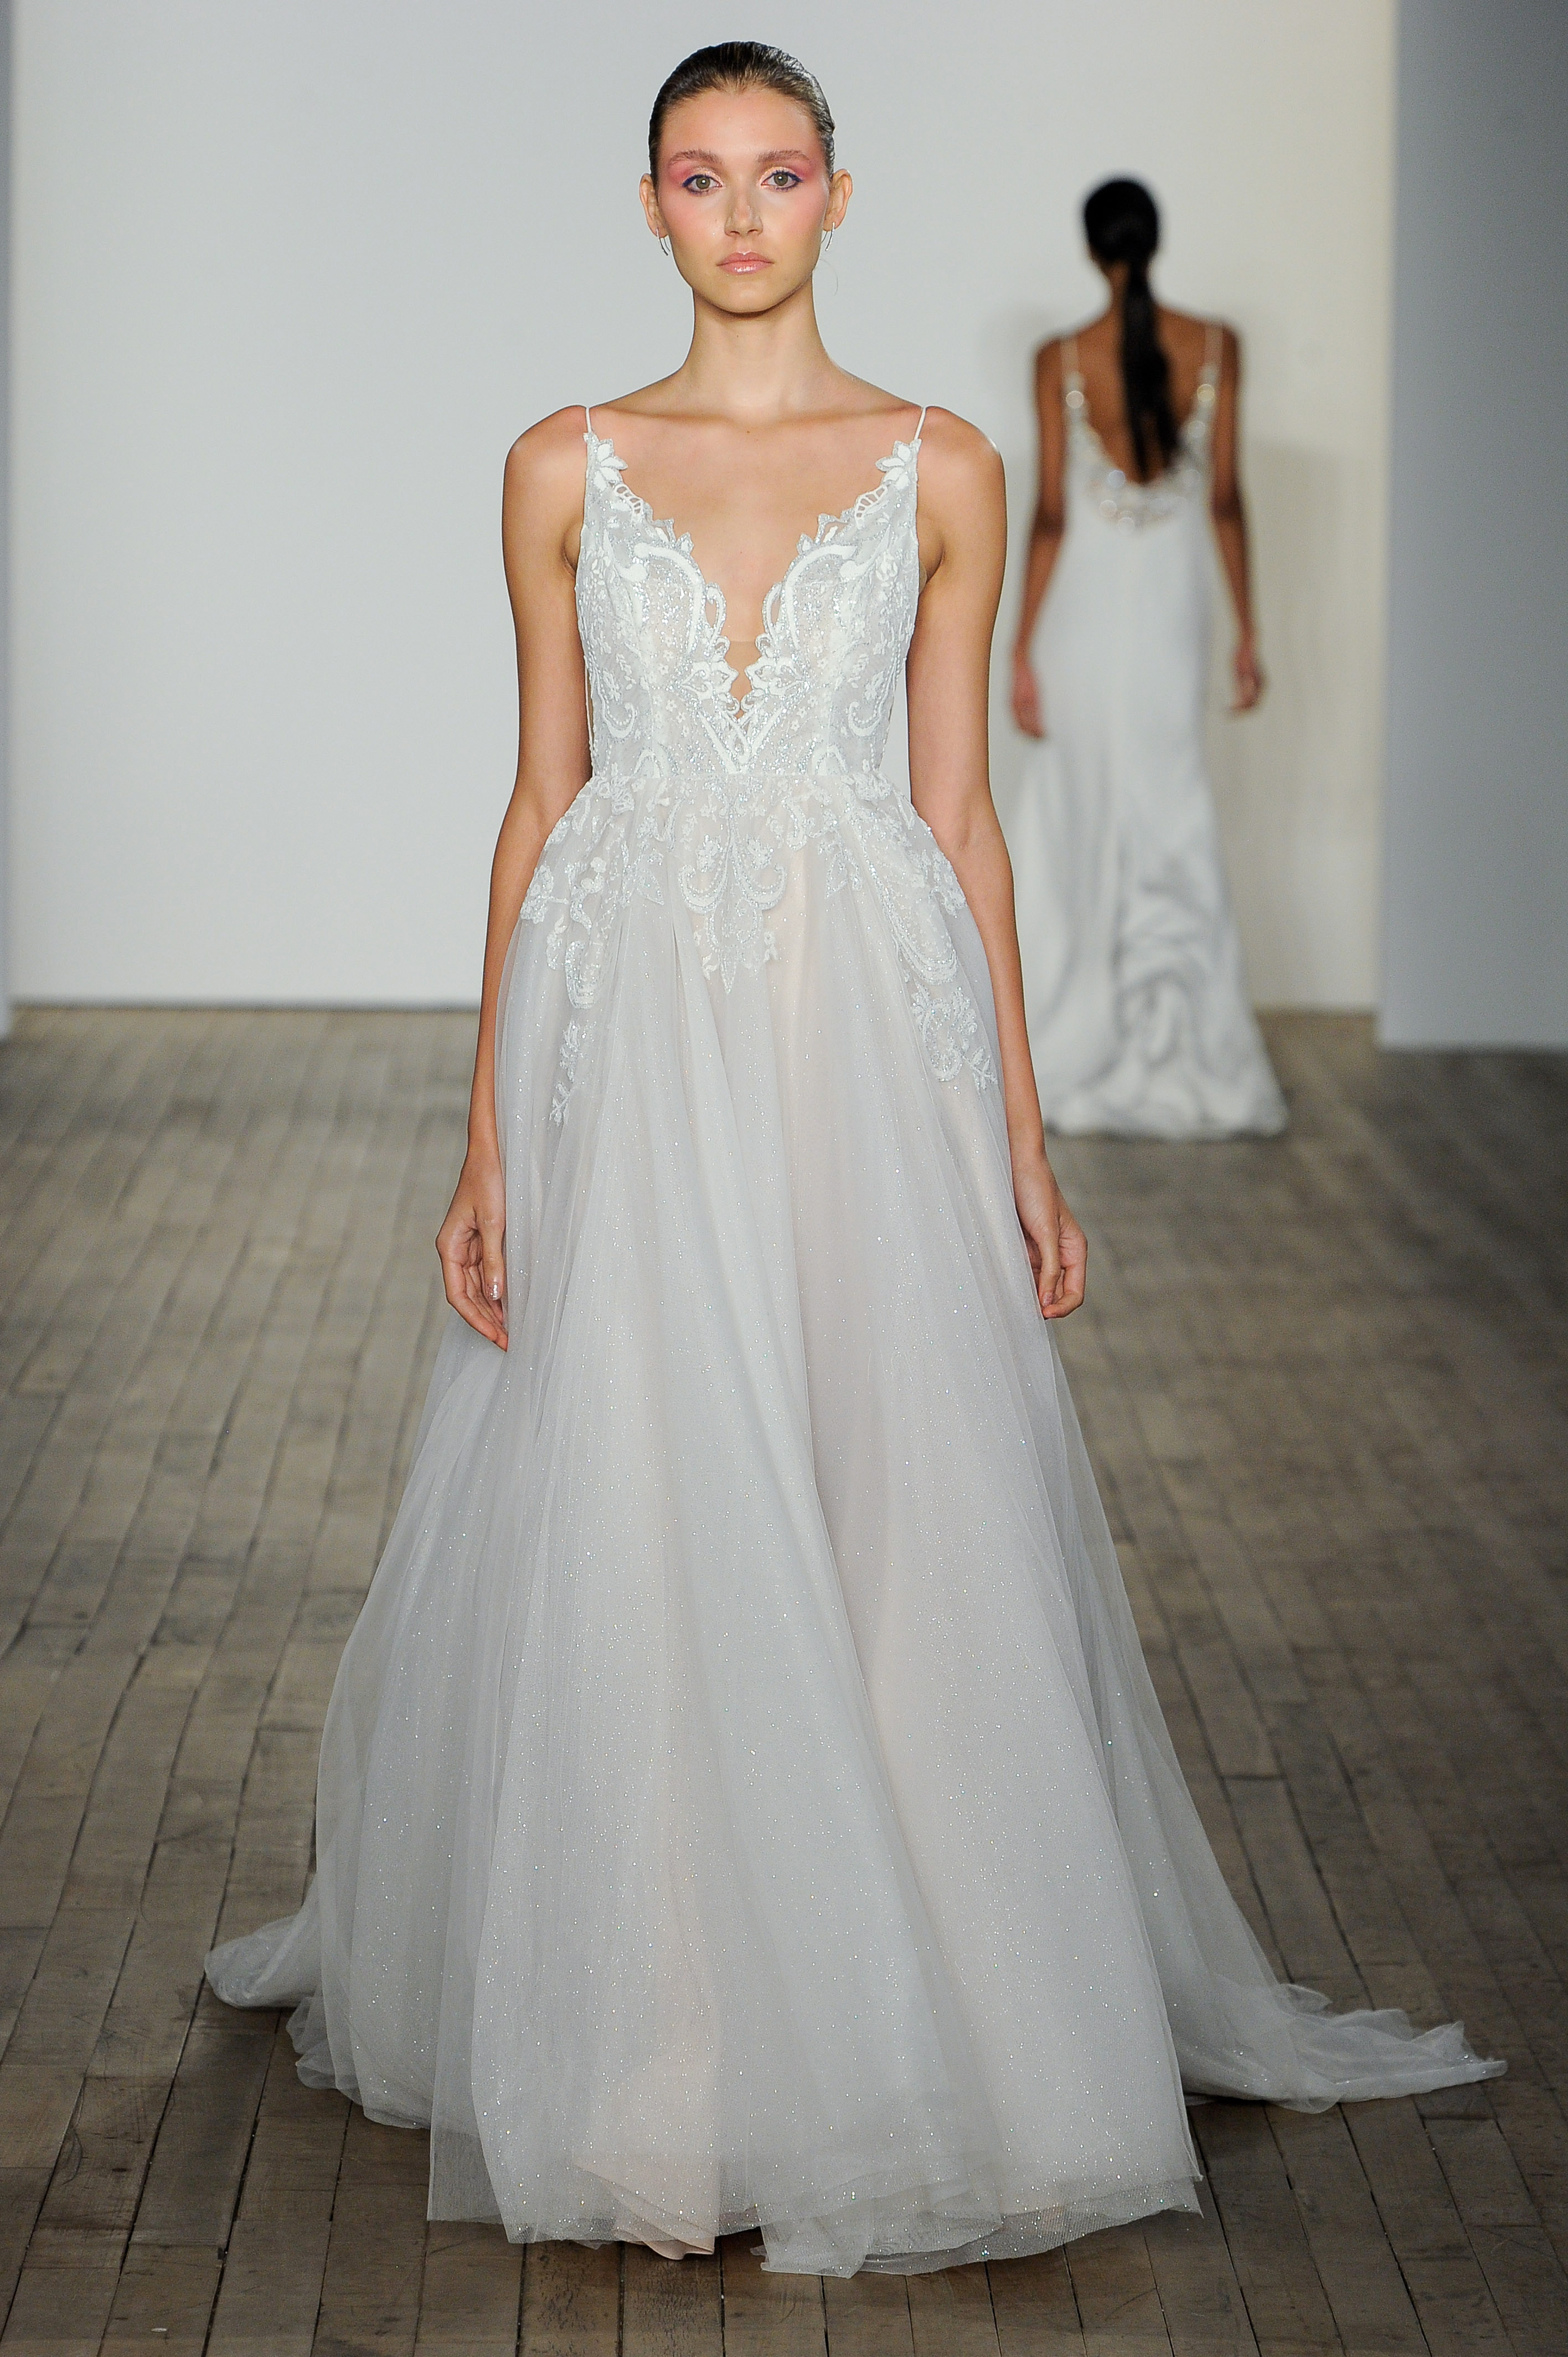 haley paige fall 2019 v-neck sheath wedding dress